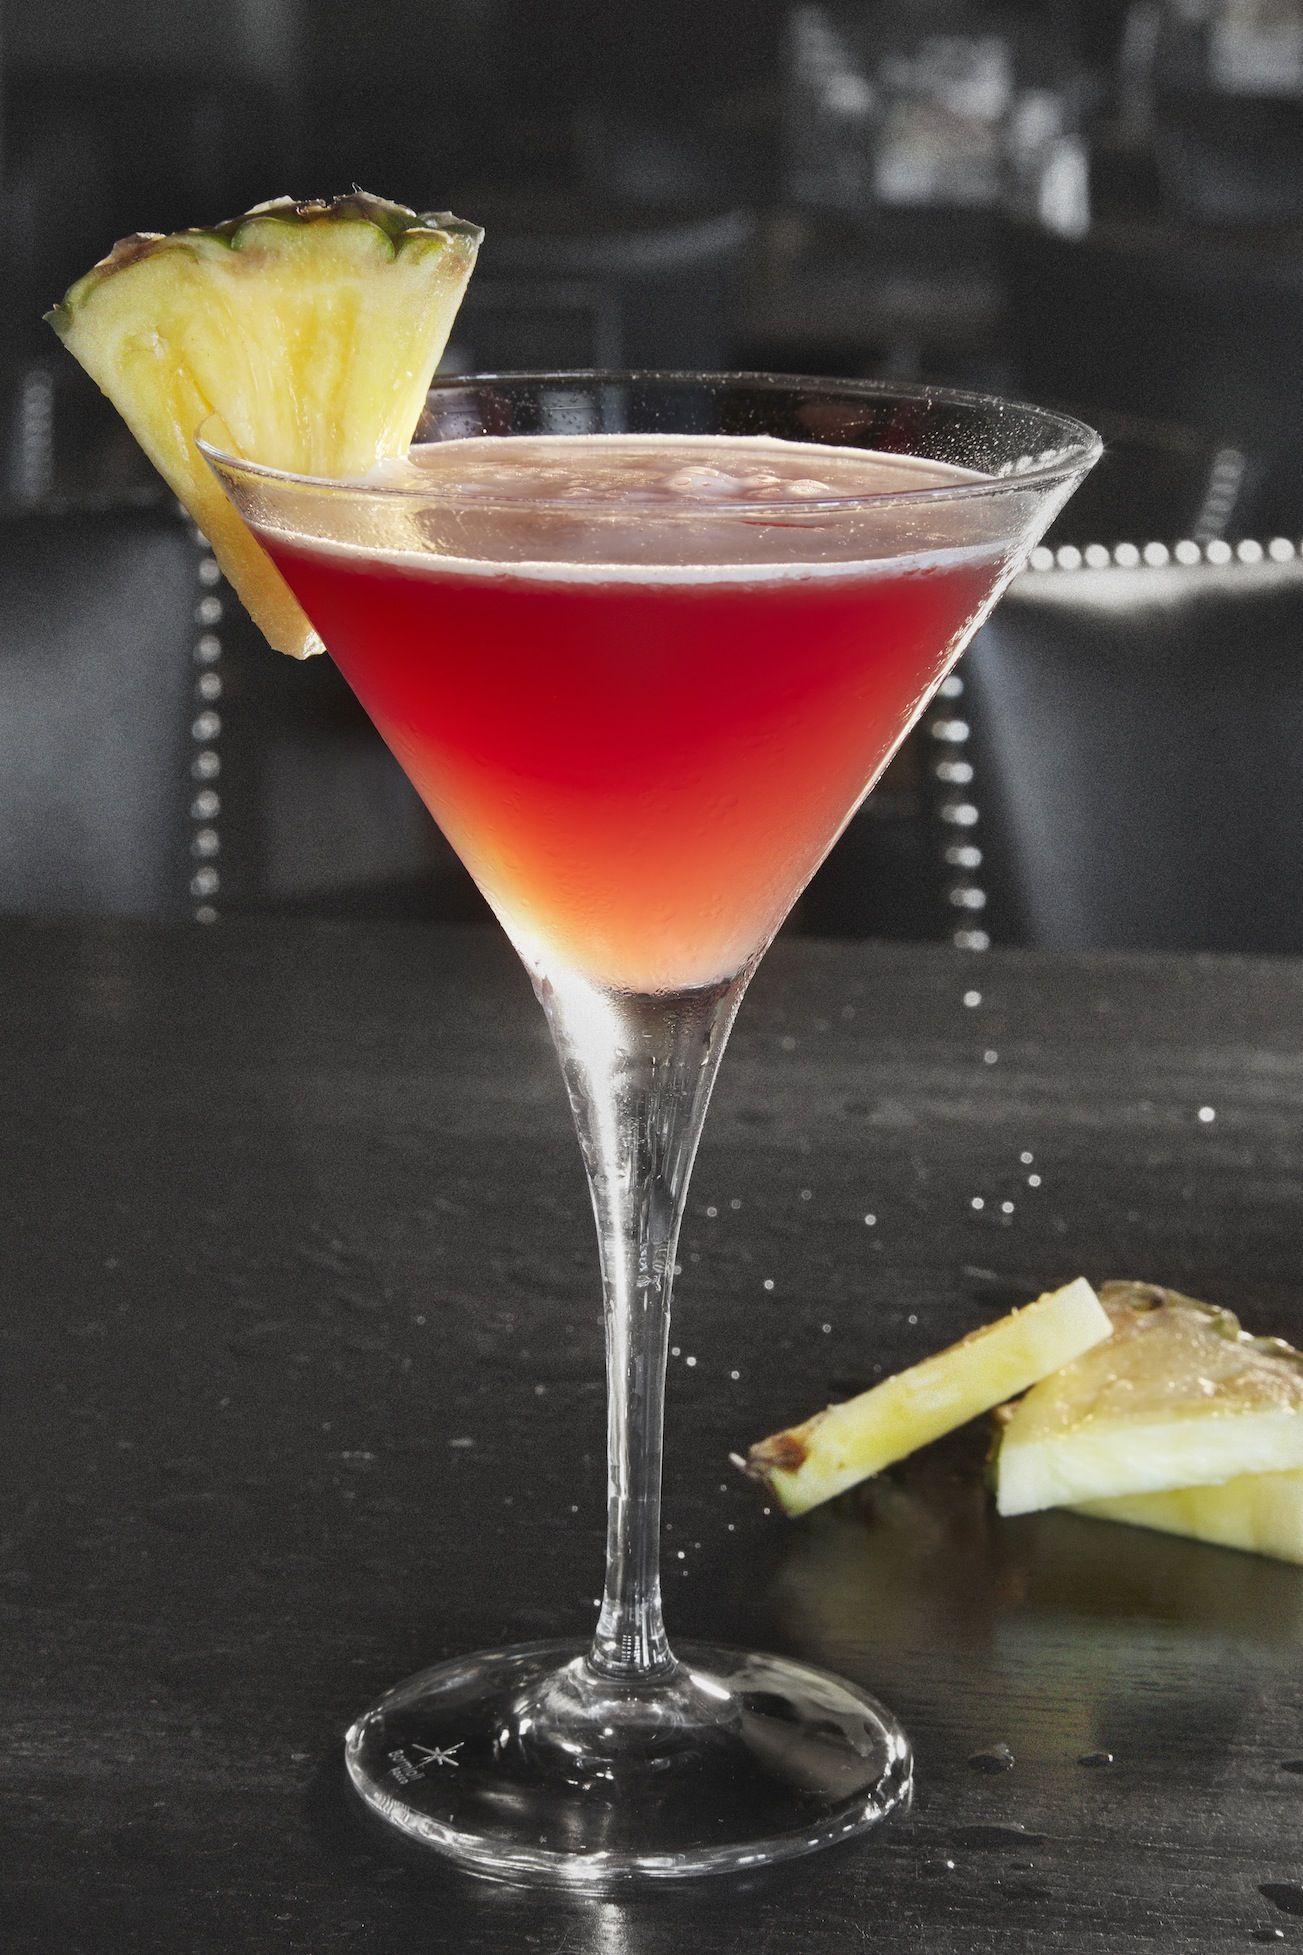 Dad S Bar Louie Diva Martini In 2020 Pineapple Vodka Martini Martini Shaker